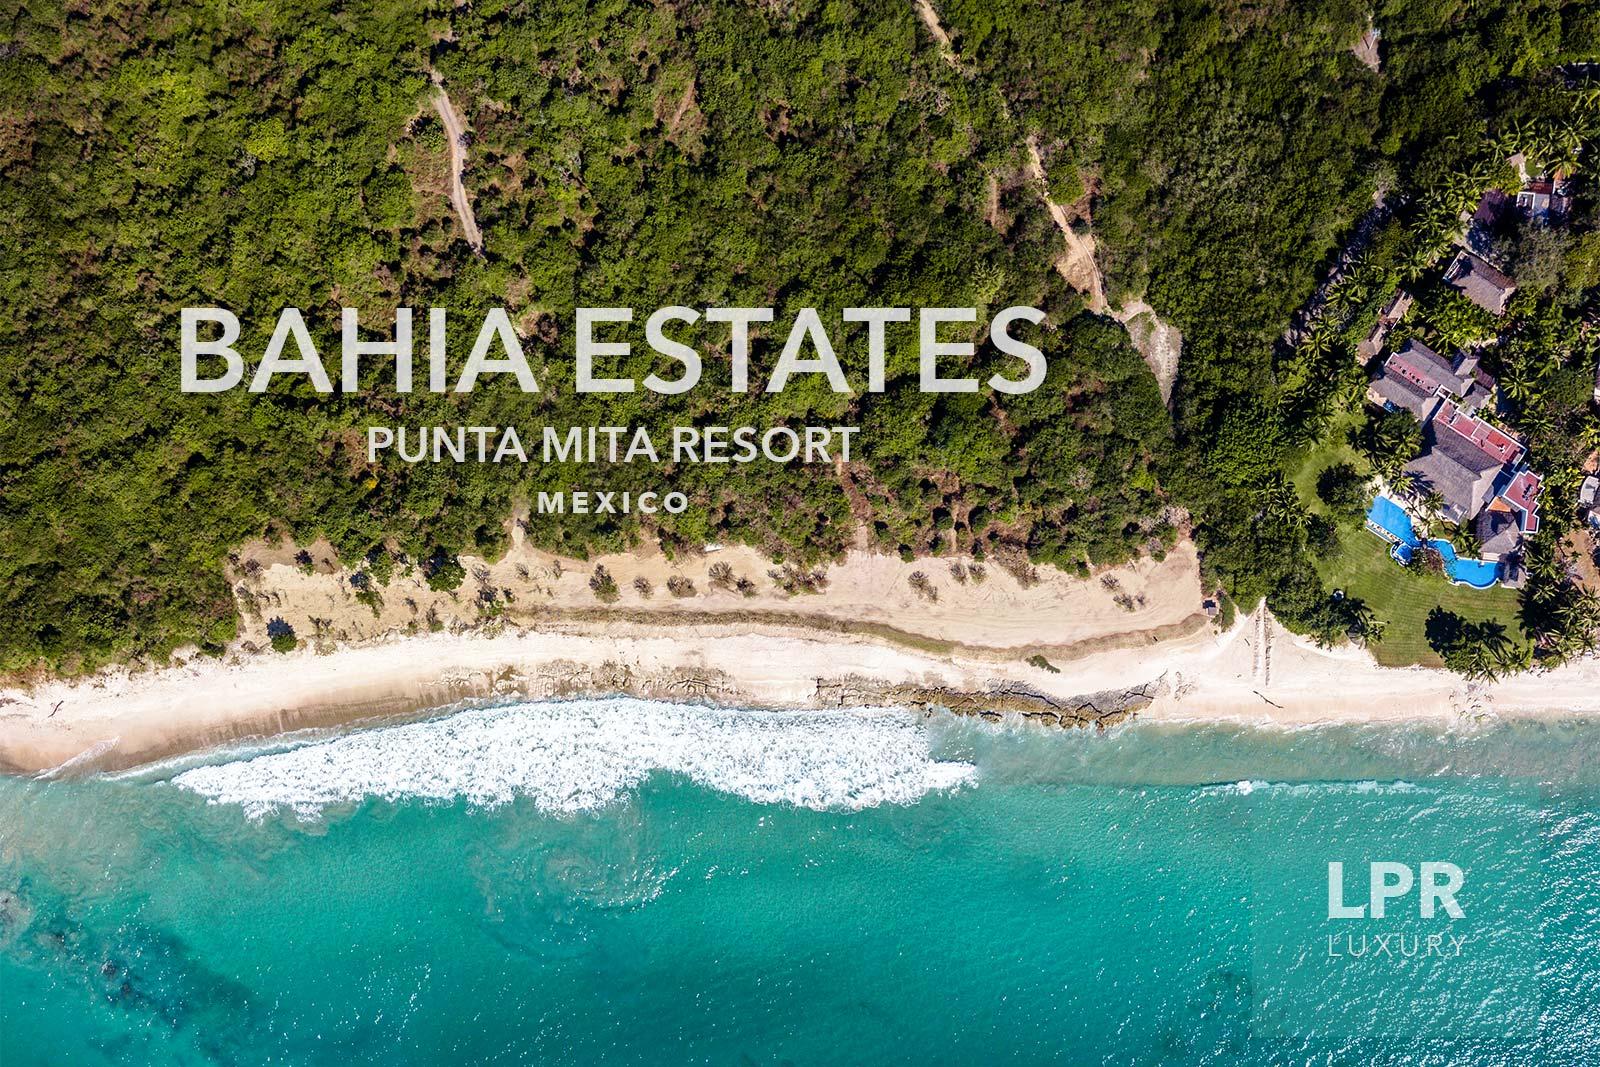 Bahia Estates - Luxury estate lots for building dream homes at the Punta Mita Resort, Riviera Nayarit, Mexico